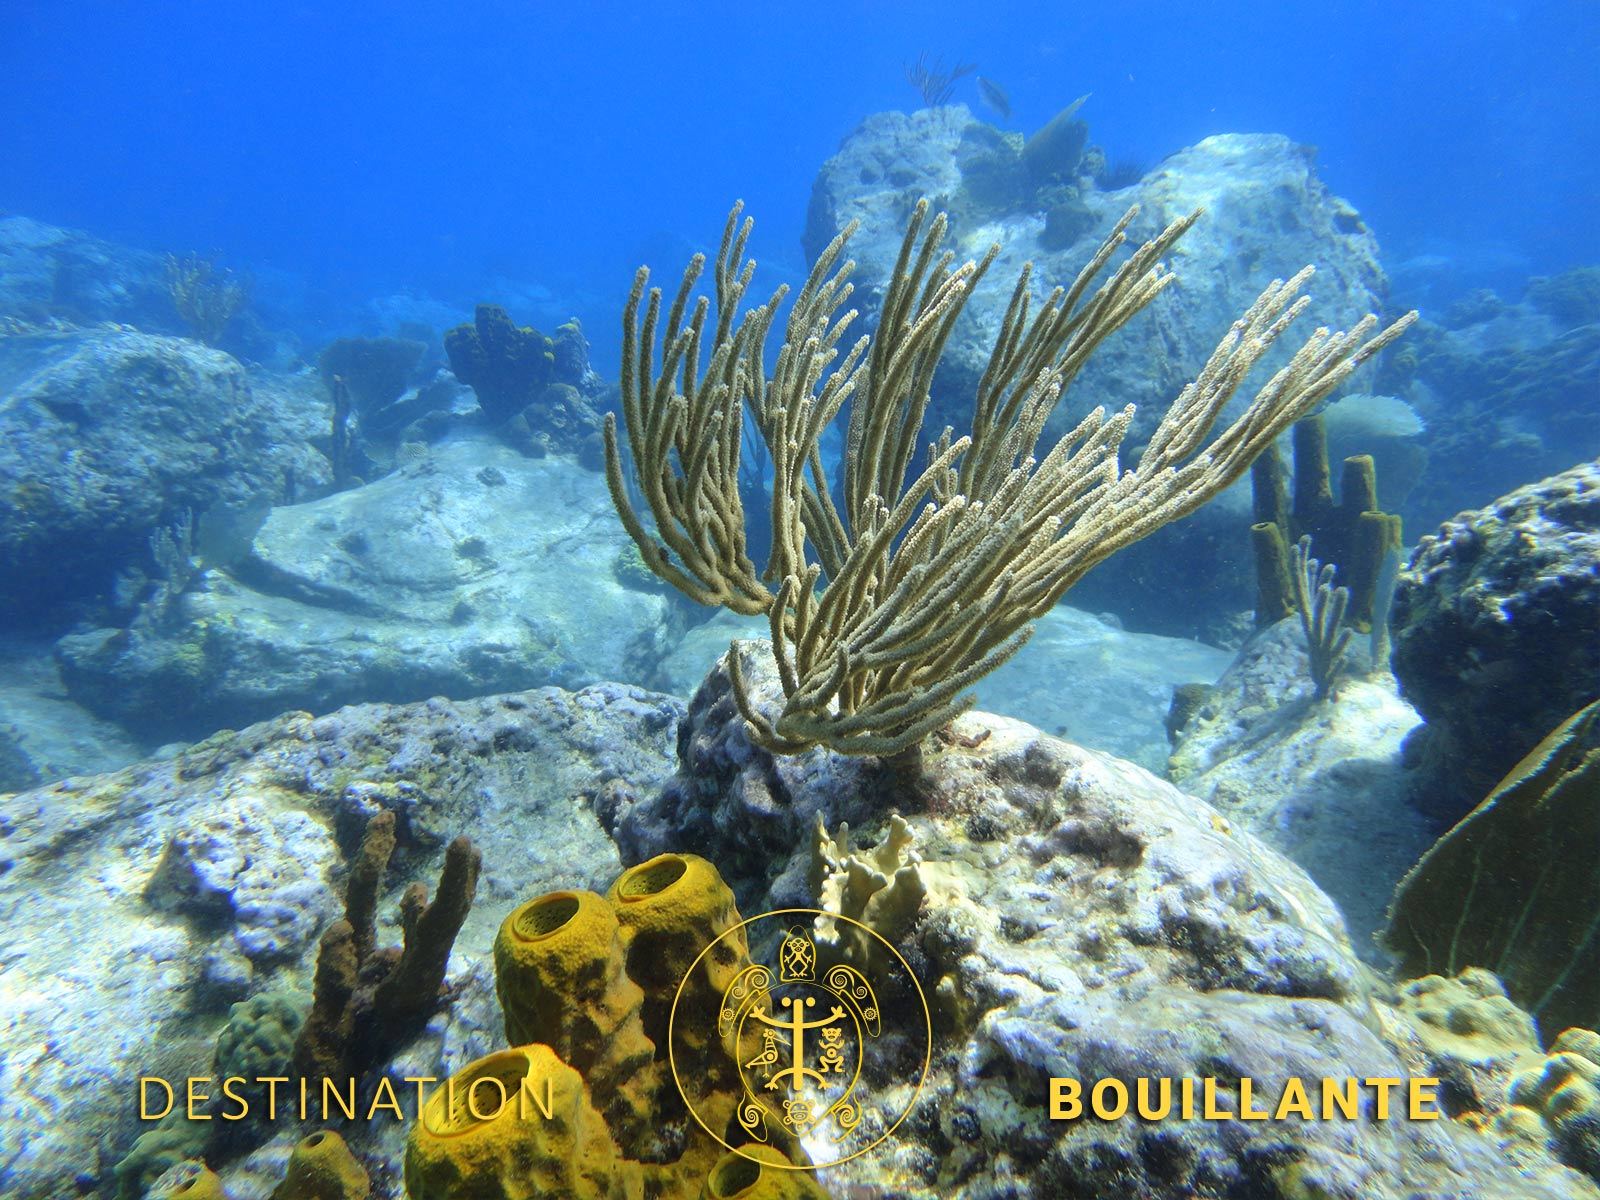 Plongée Petite-Anse - Bouillante